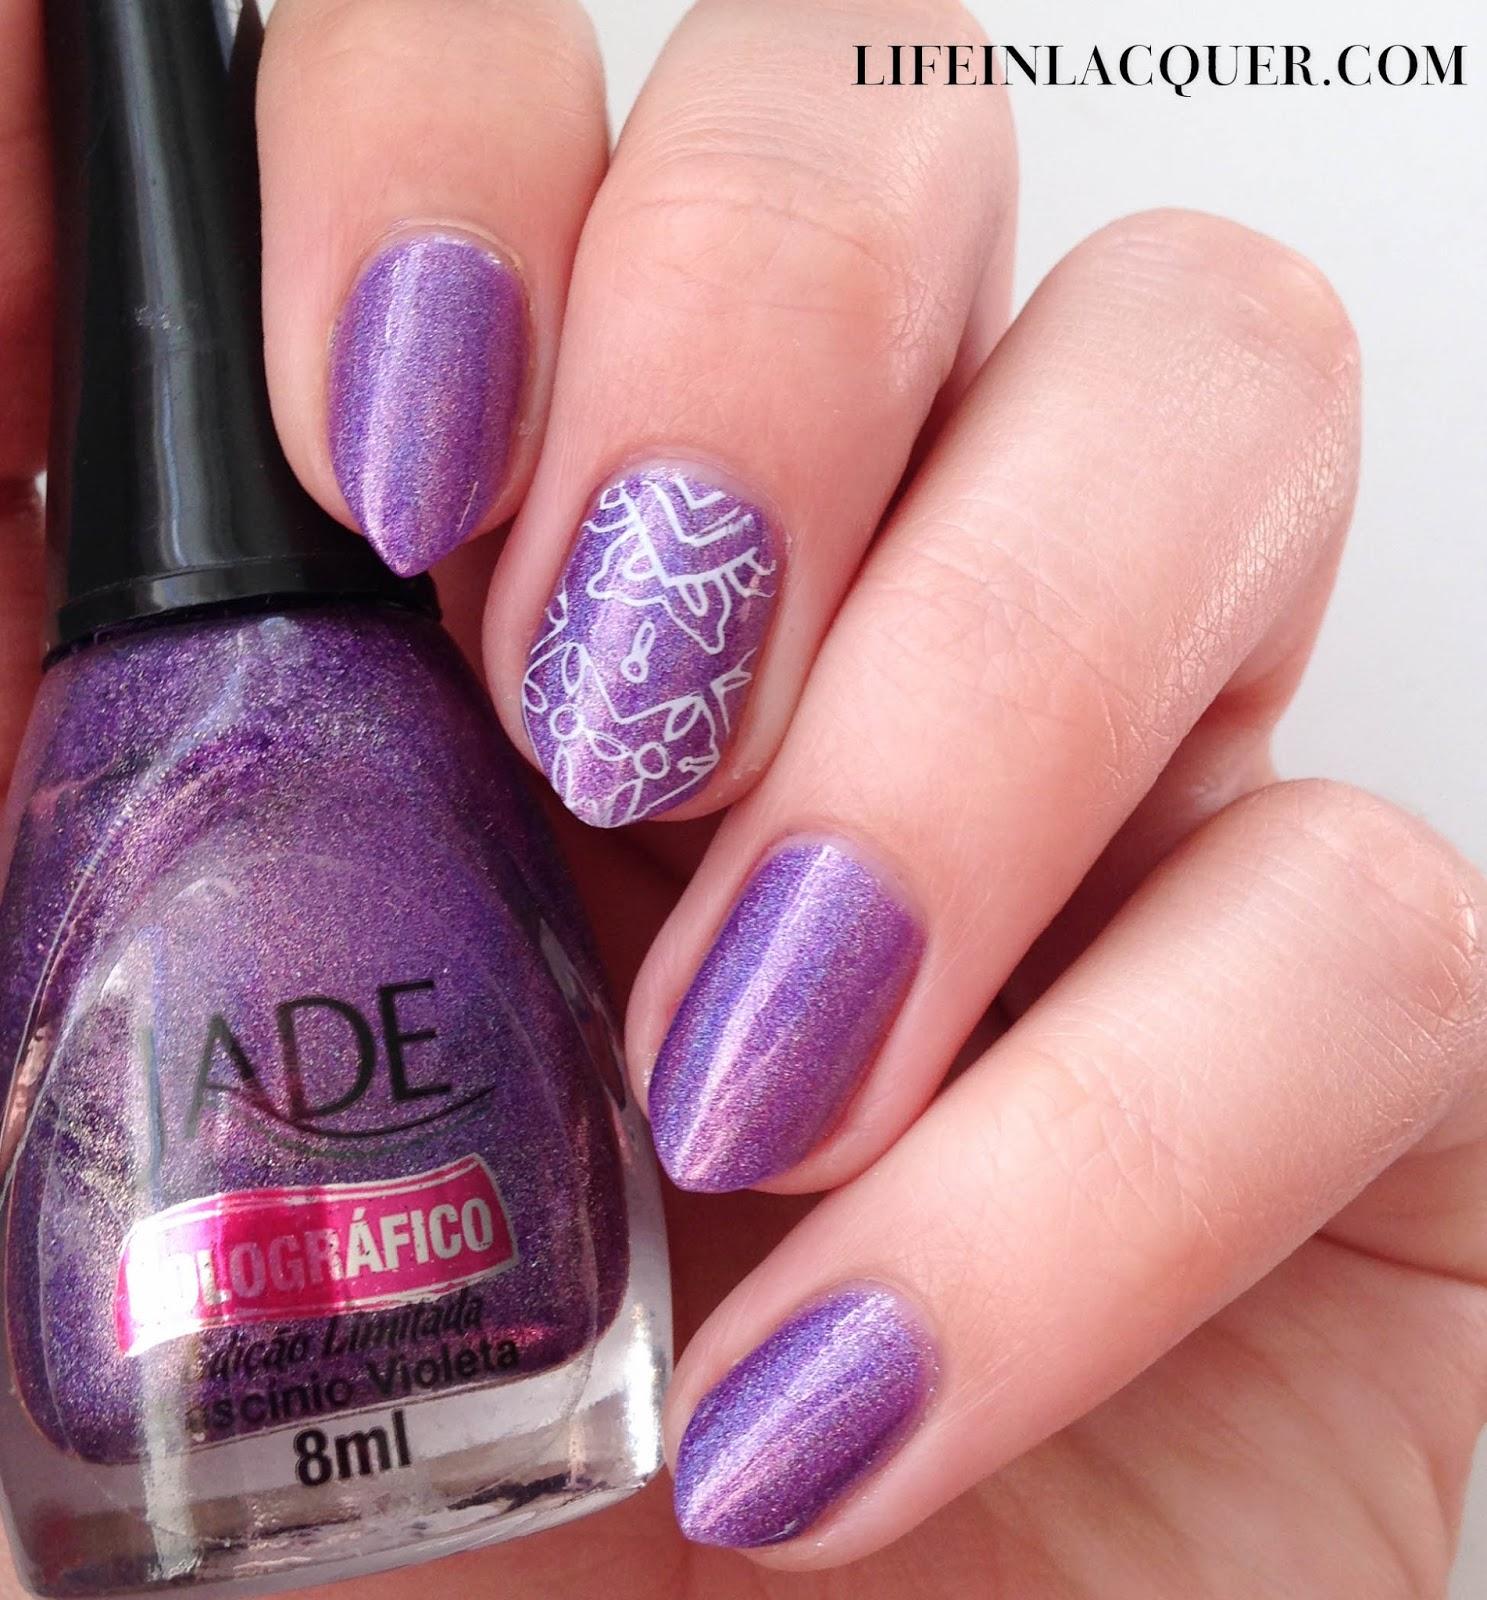 Jade Holografico stamping nail art holo purple